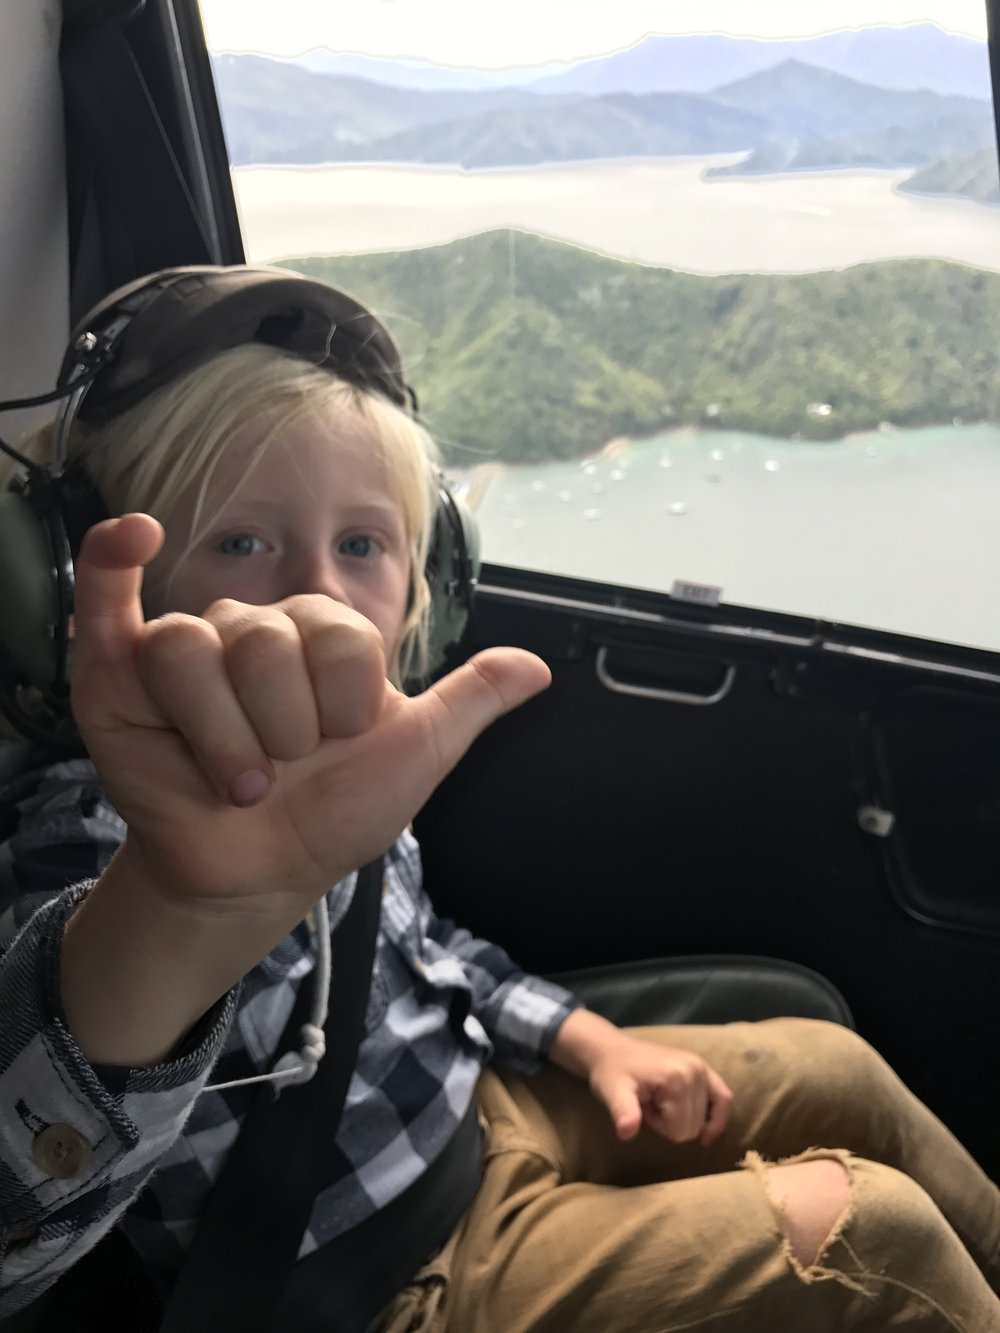 belandbeau_family adventure helicopter ride new zealand_7.jpg